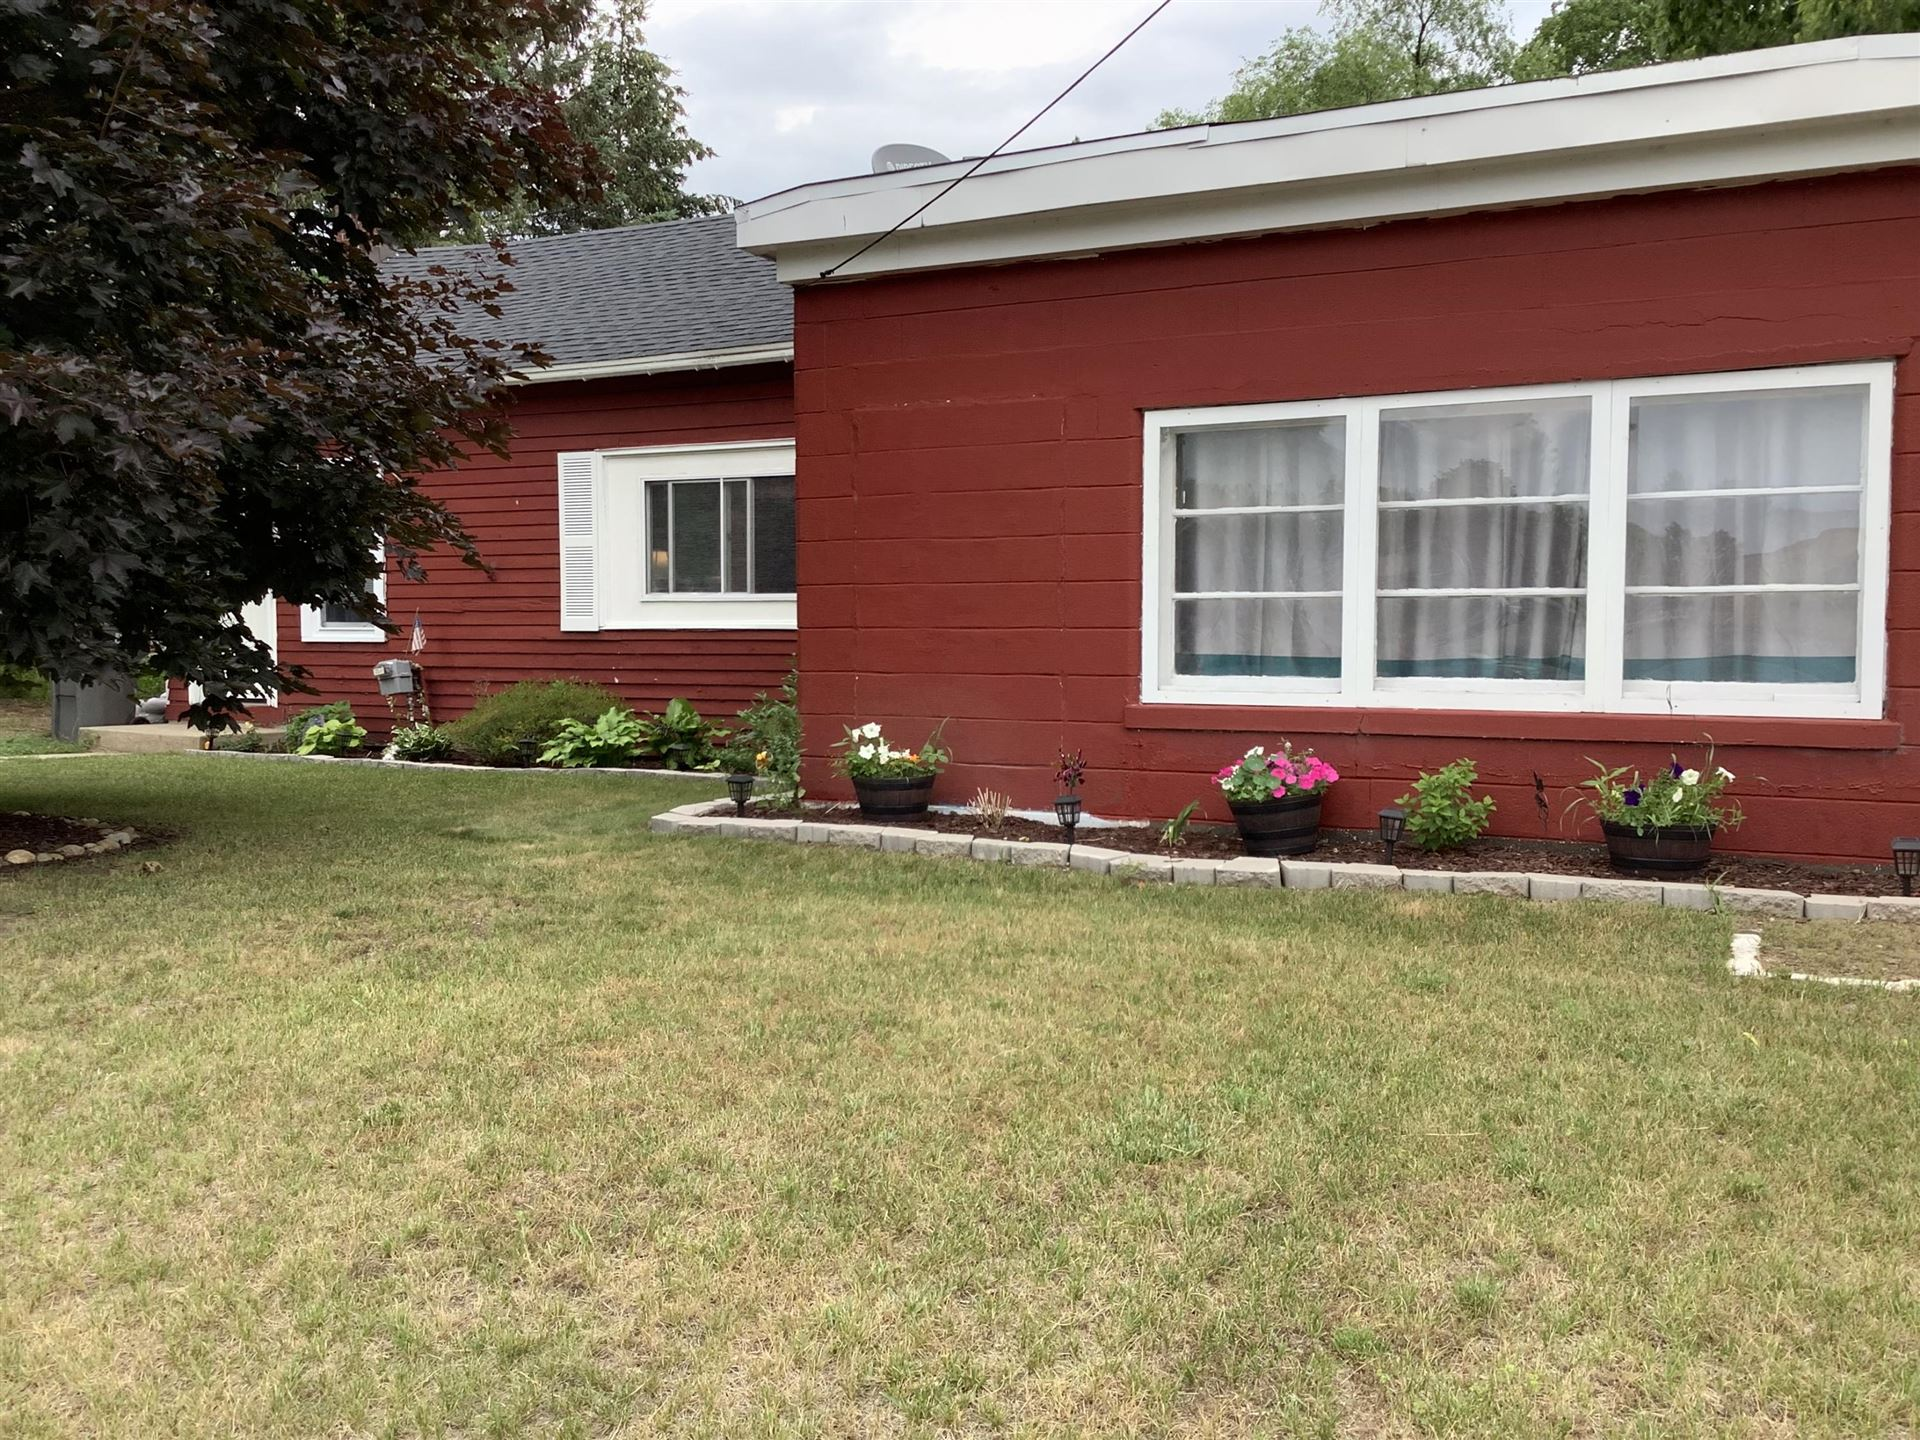 Photo of 115 N Division Street, Lowell, MI 49331 (MLS # 21024911)